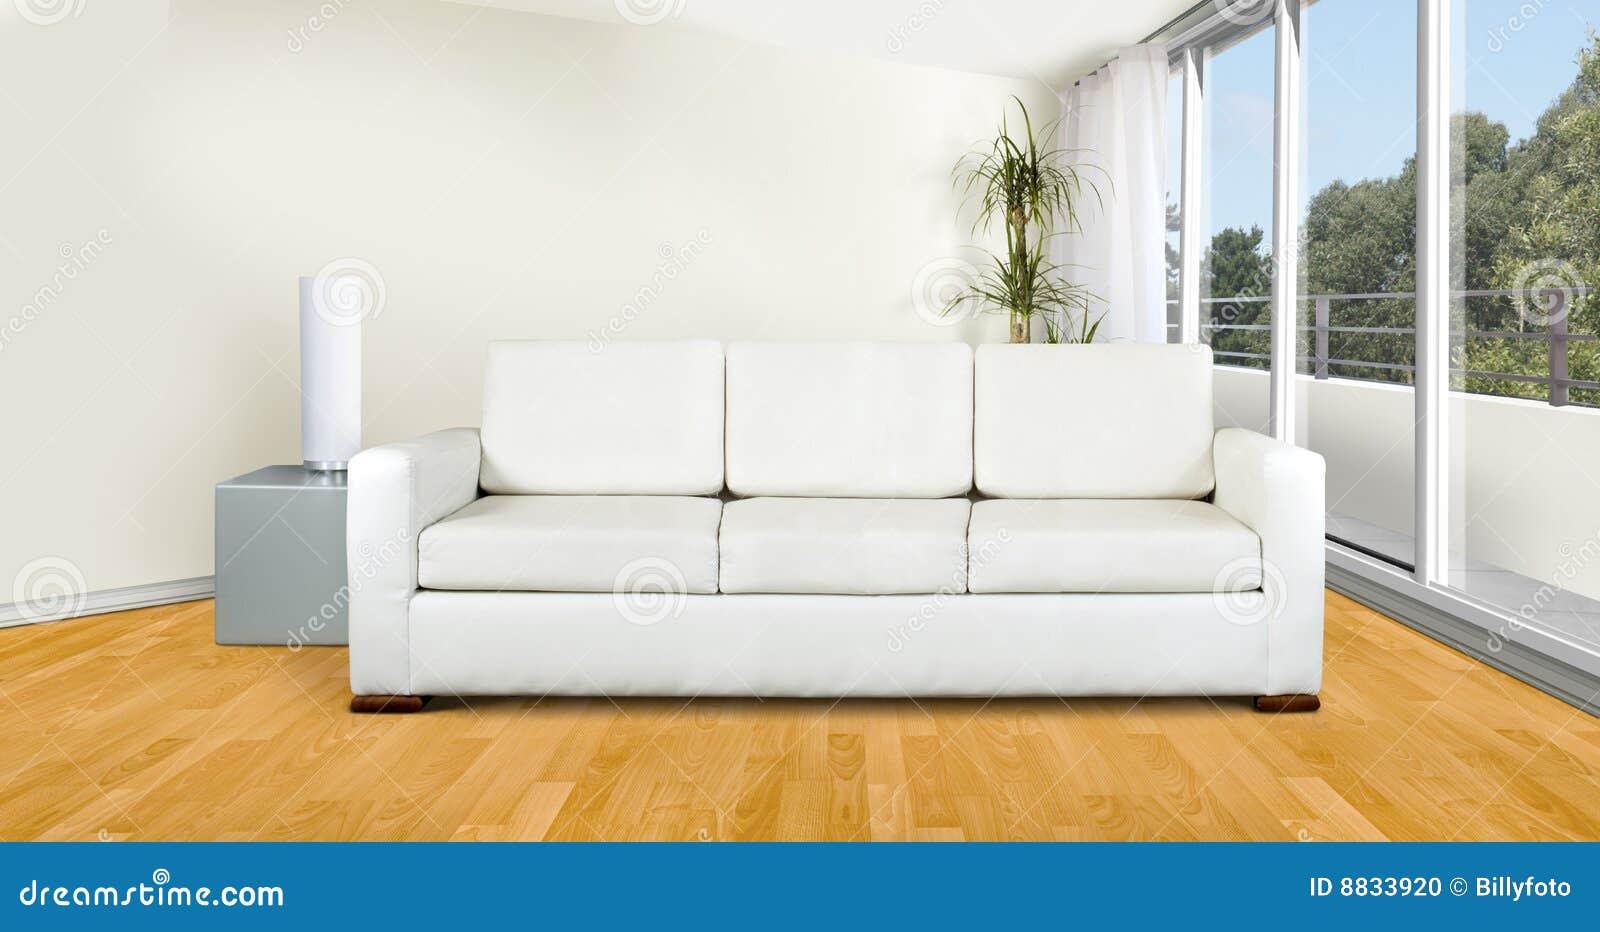 weisses sofa gallery of bigsofa marbeya xcm weiss mit. Black Bedroom Furniture Sets. Home Design Ideas